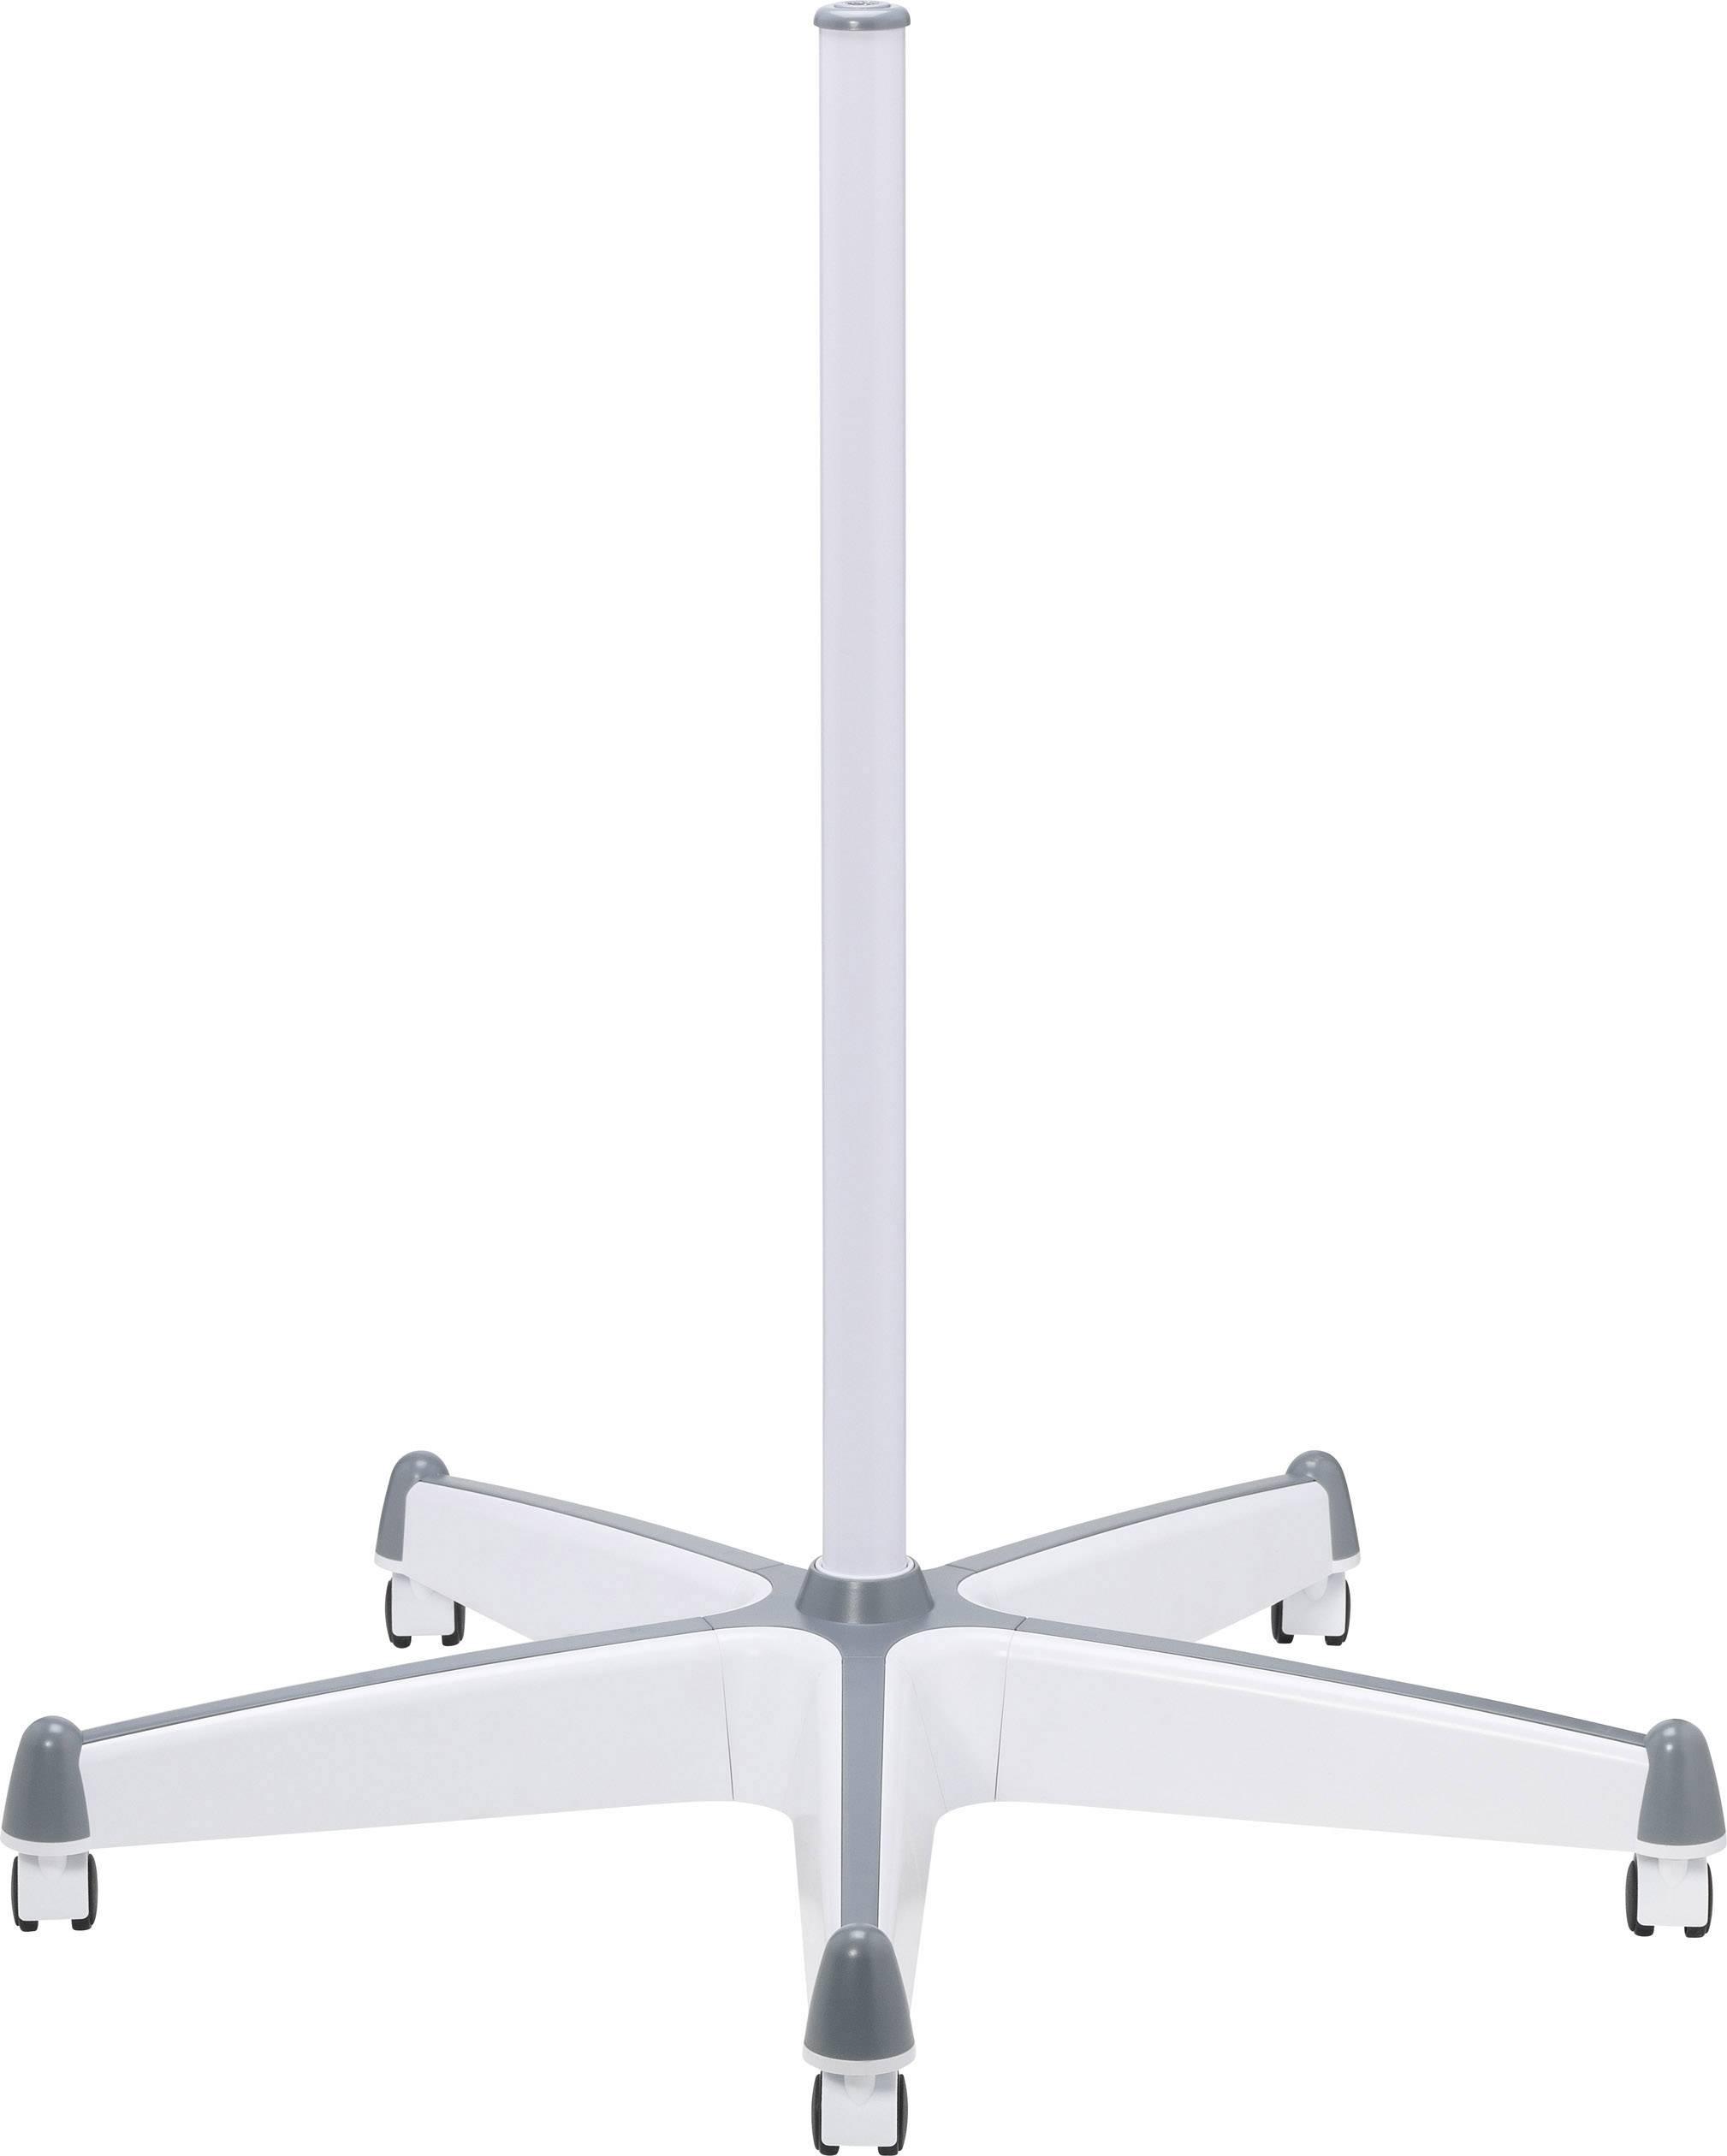 Pojazdný stojan na lupu s LED lampou TOOLCRAFT 960113C04